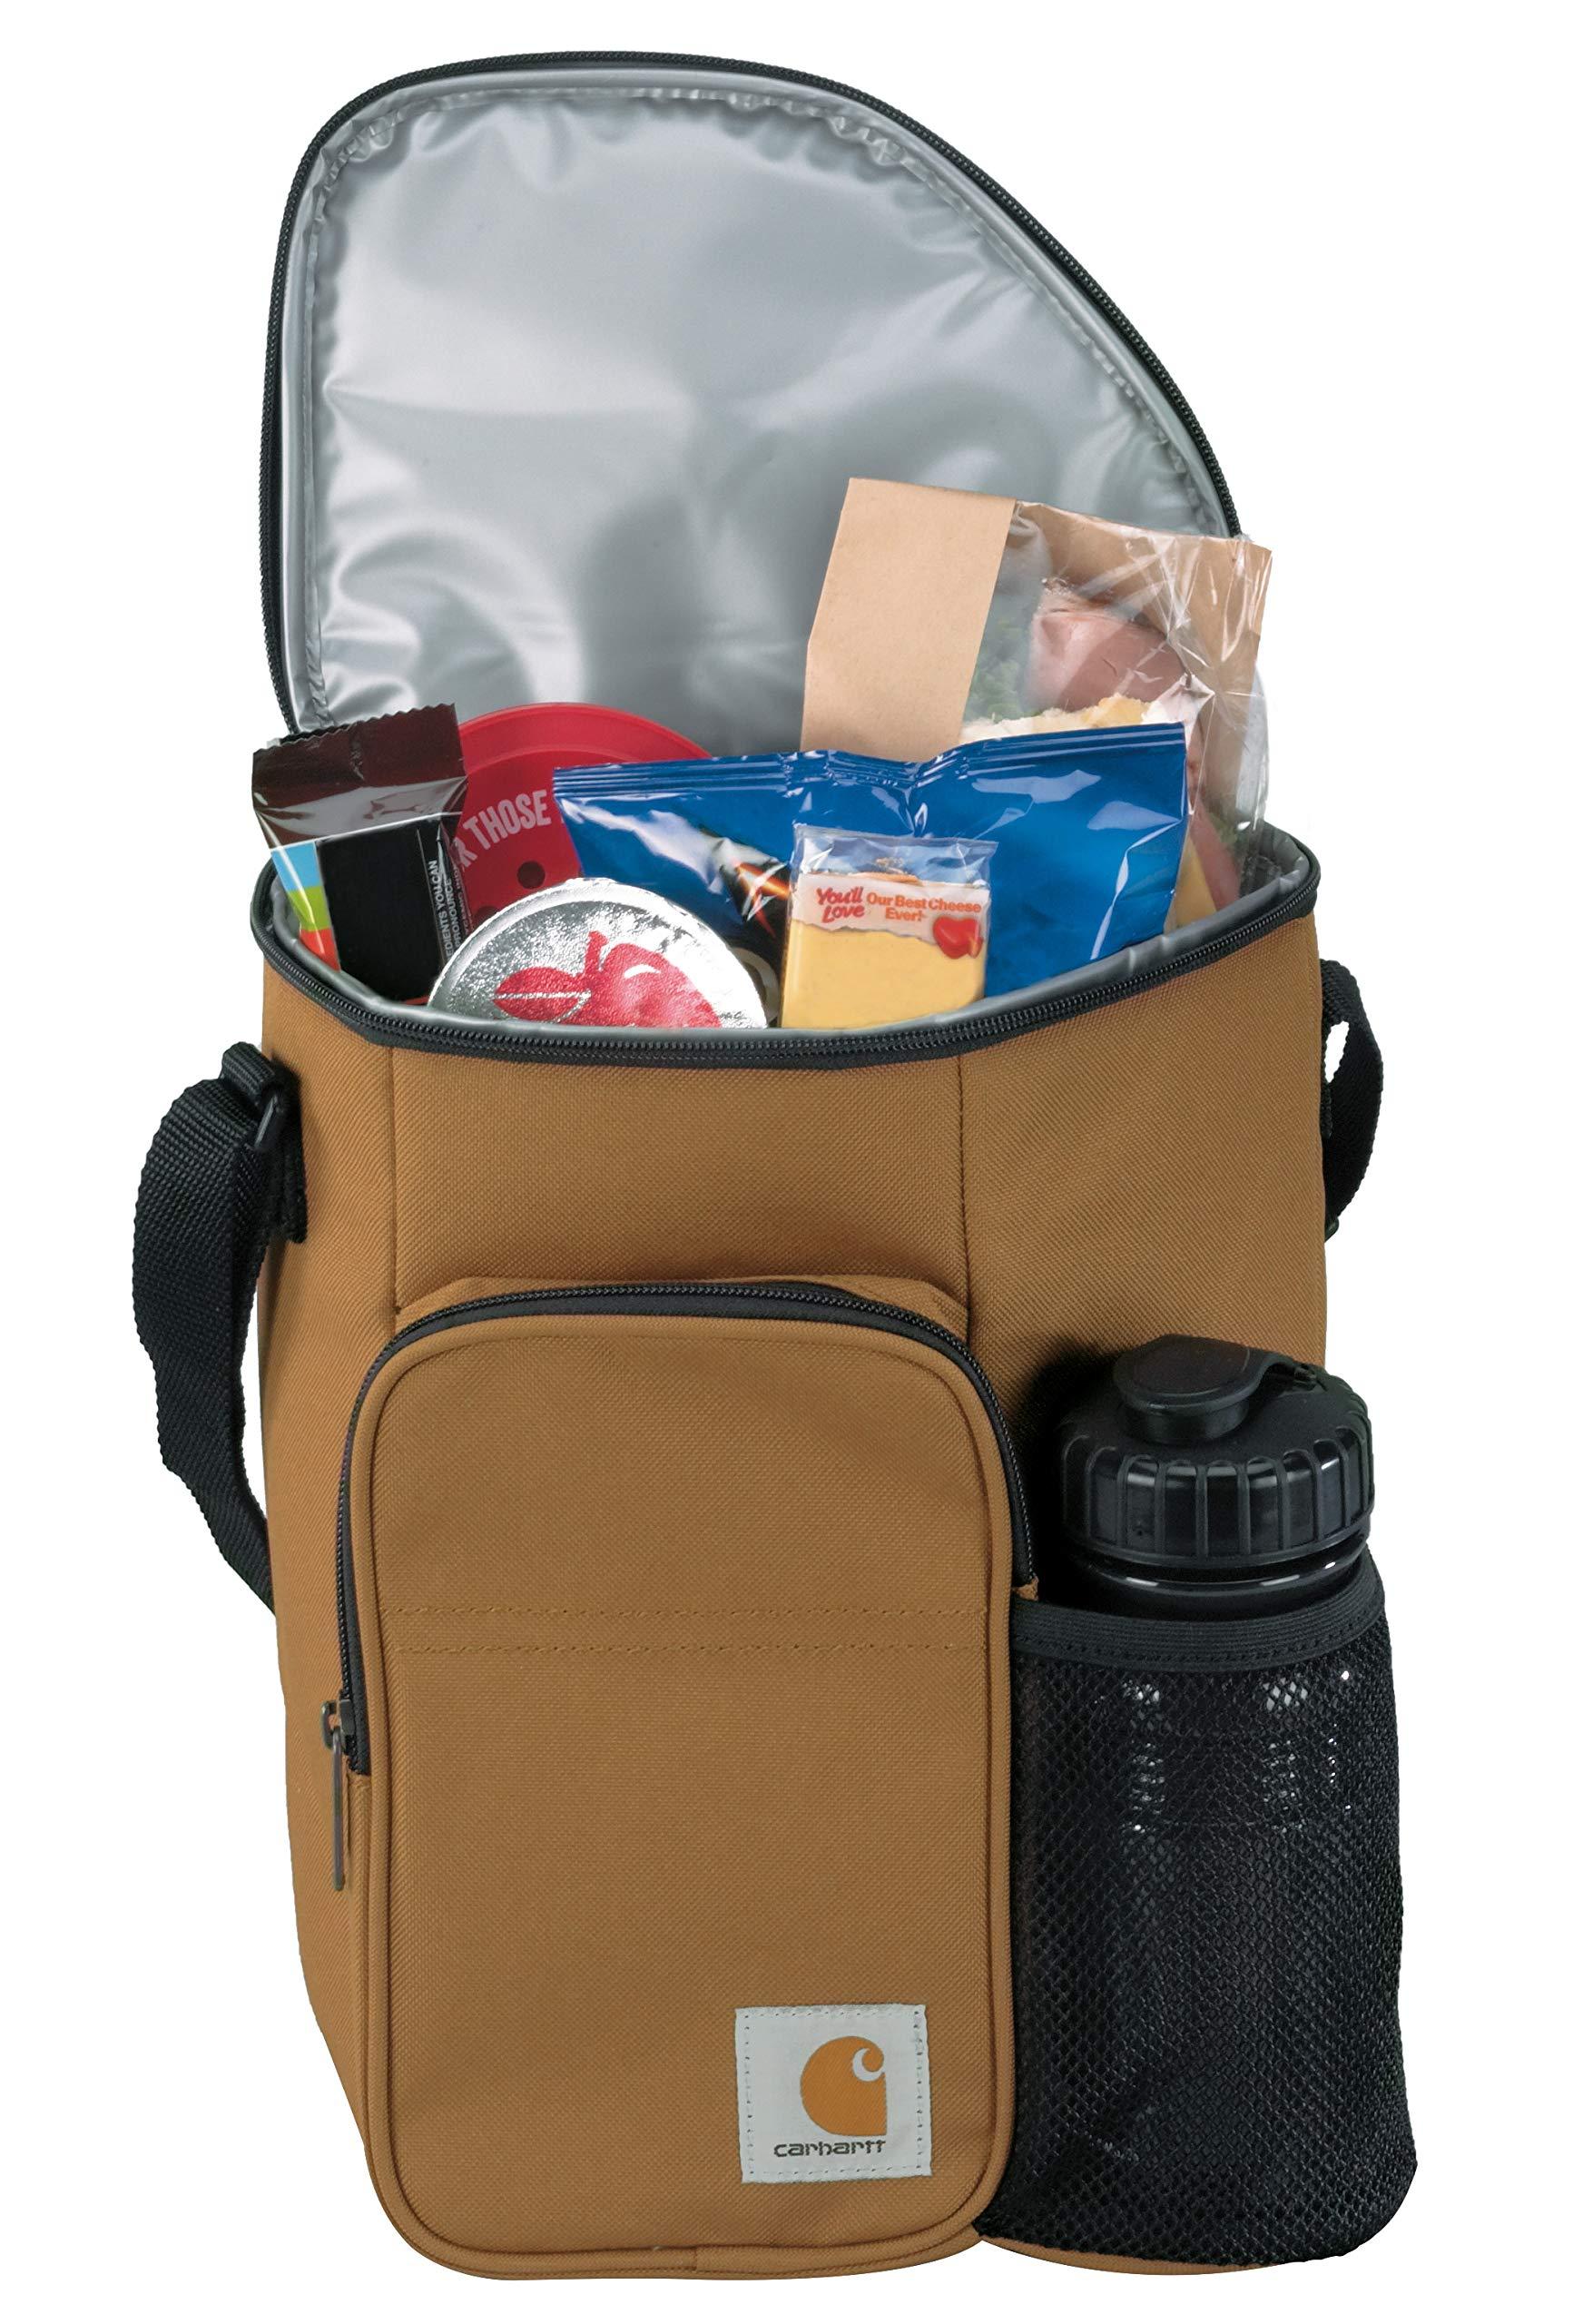 753dfad56702 Carhartt Unisex Vertical Lunch Cooler w/Water Bottle